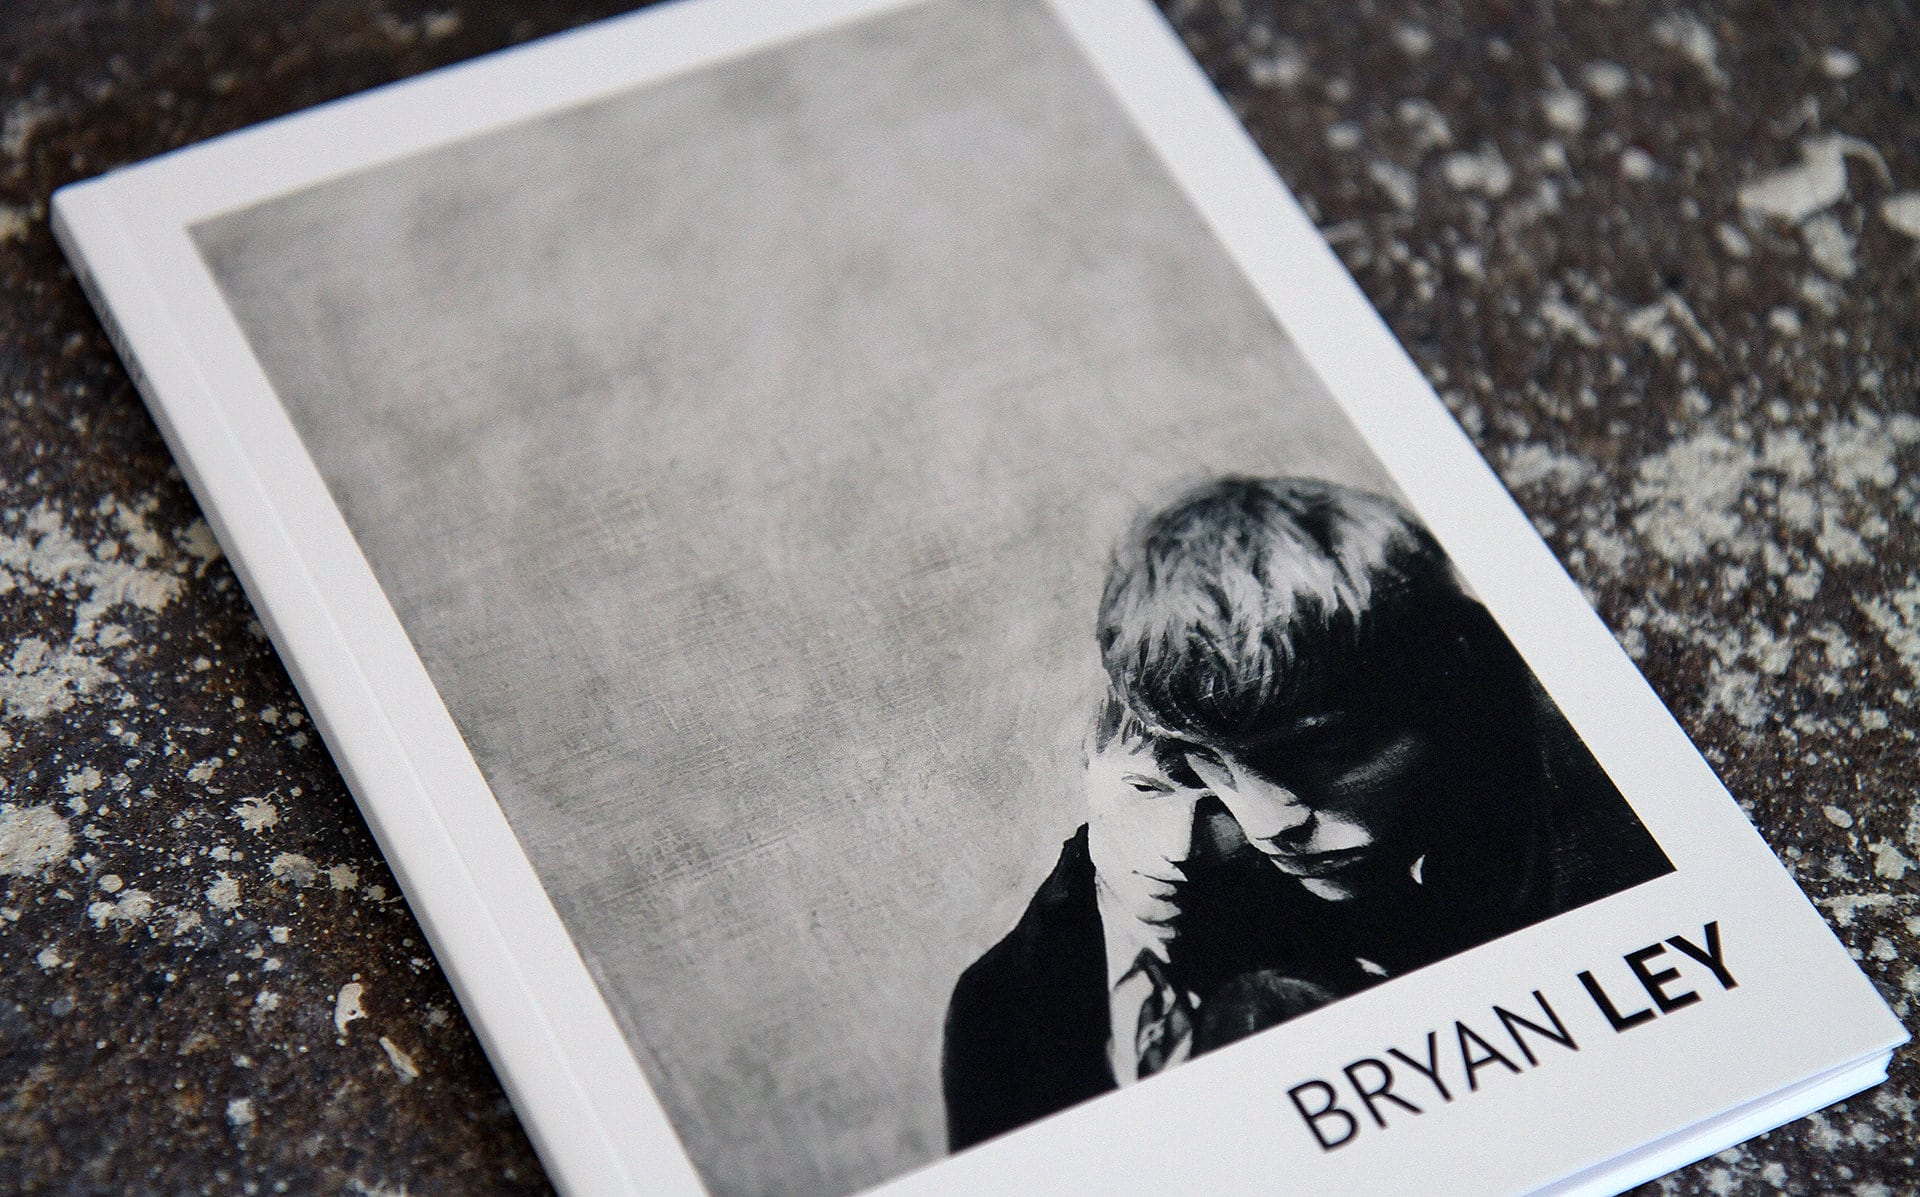 Bryan Ley